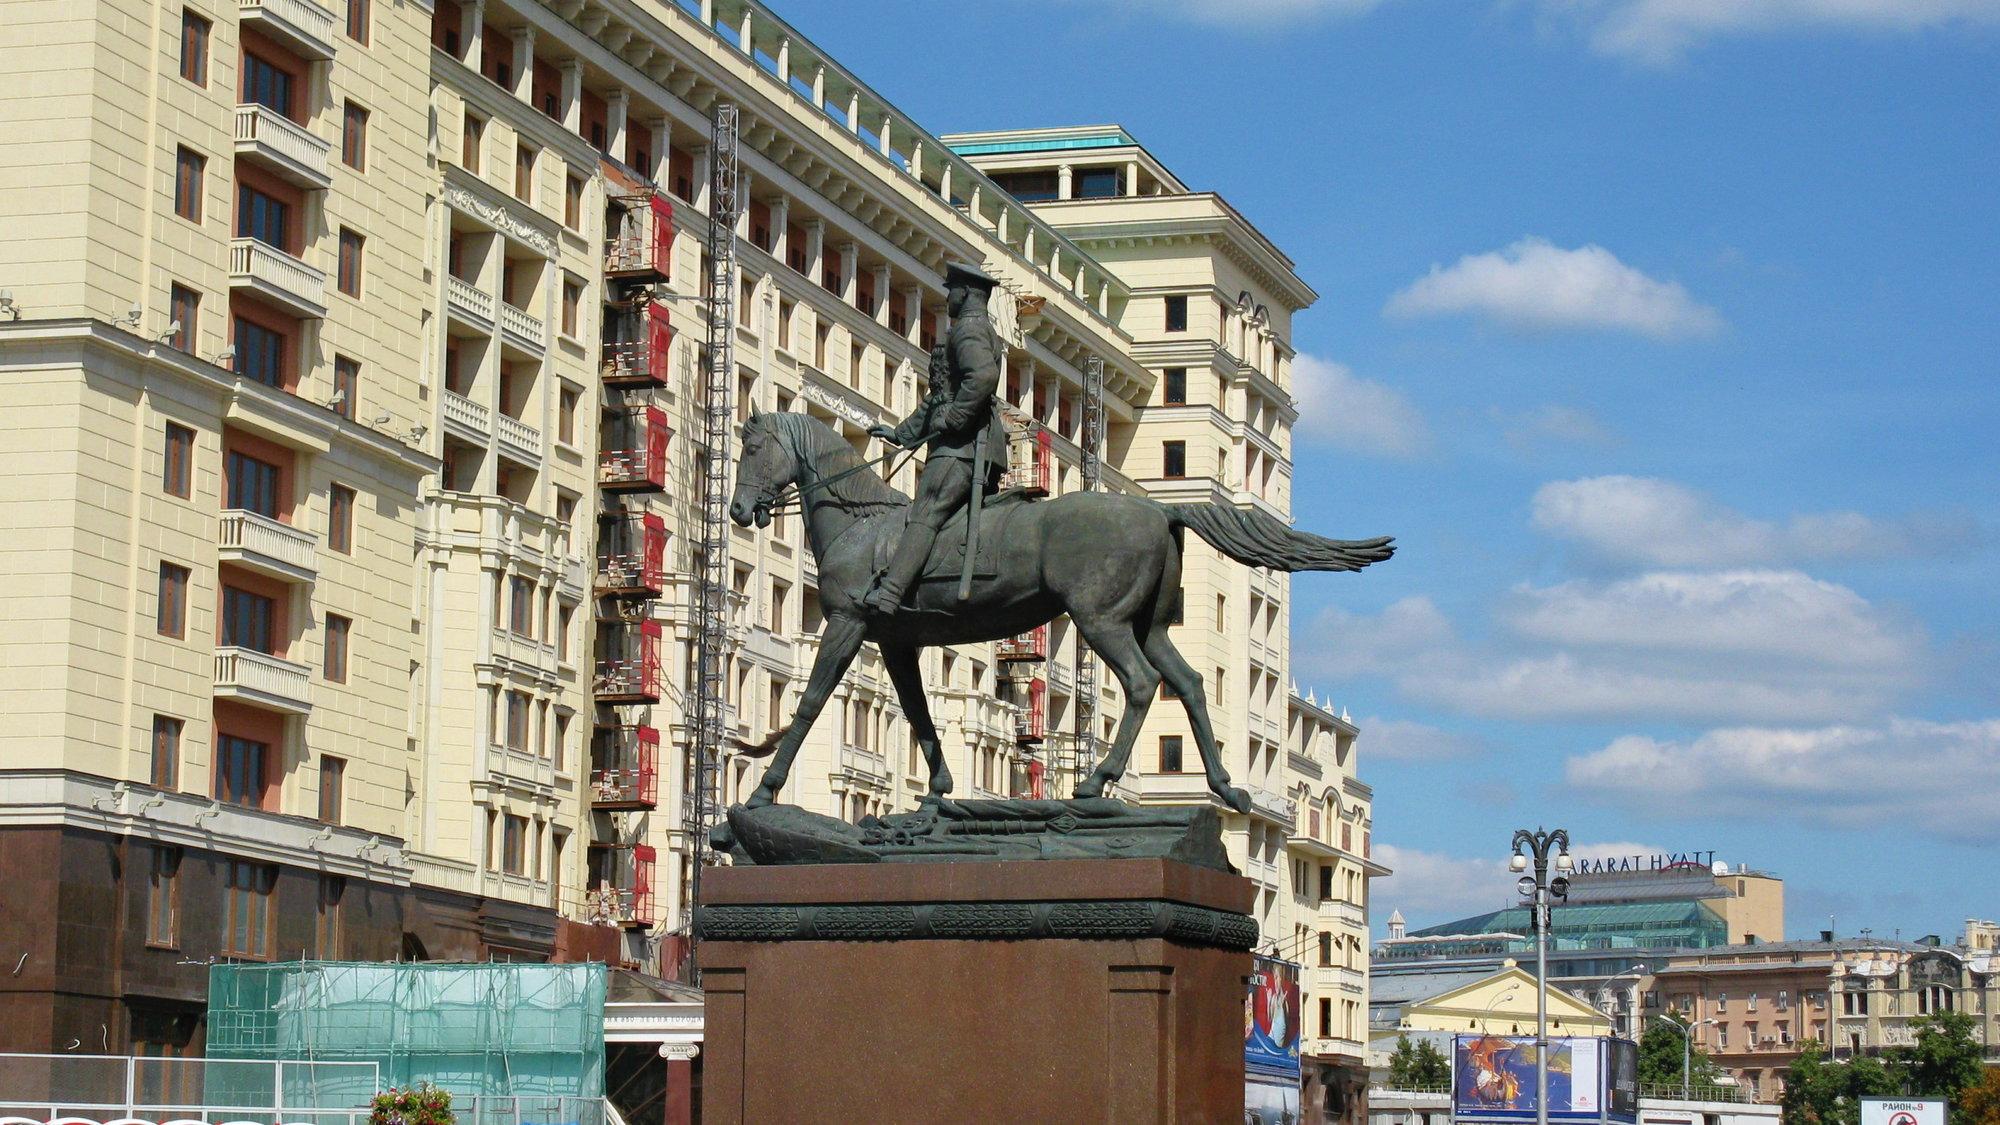 socha maršála Georgije Žukova před budovou muzea